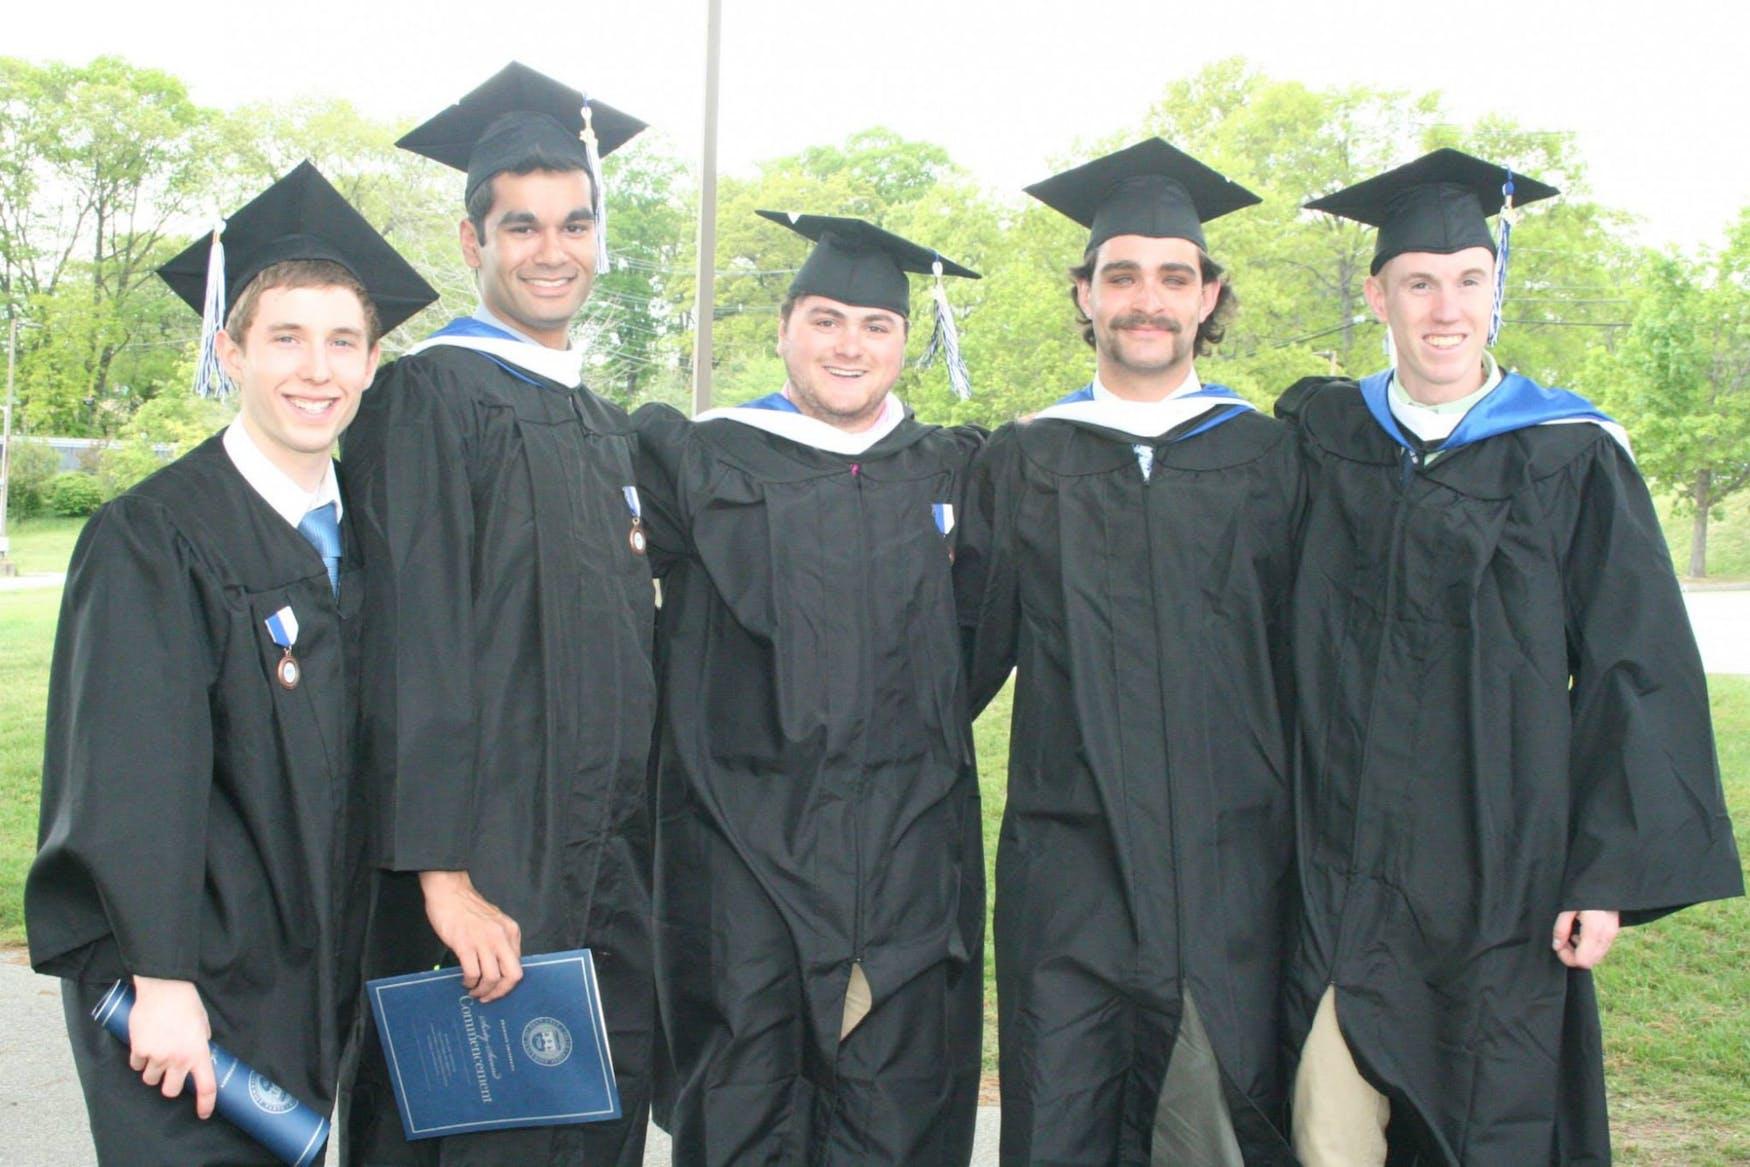 justin-booska-graduation-photo